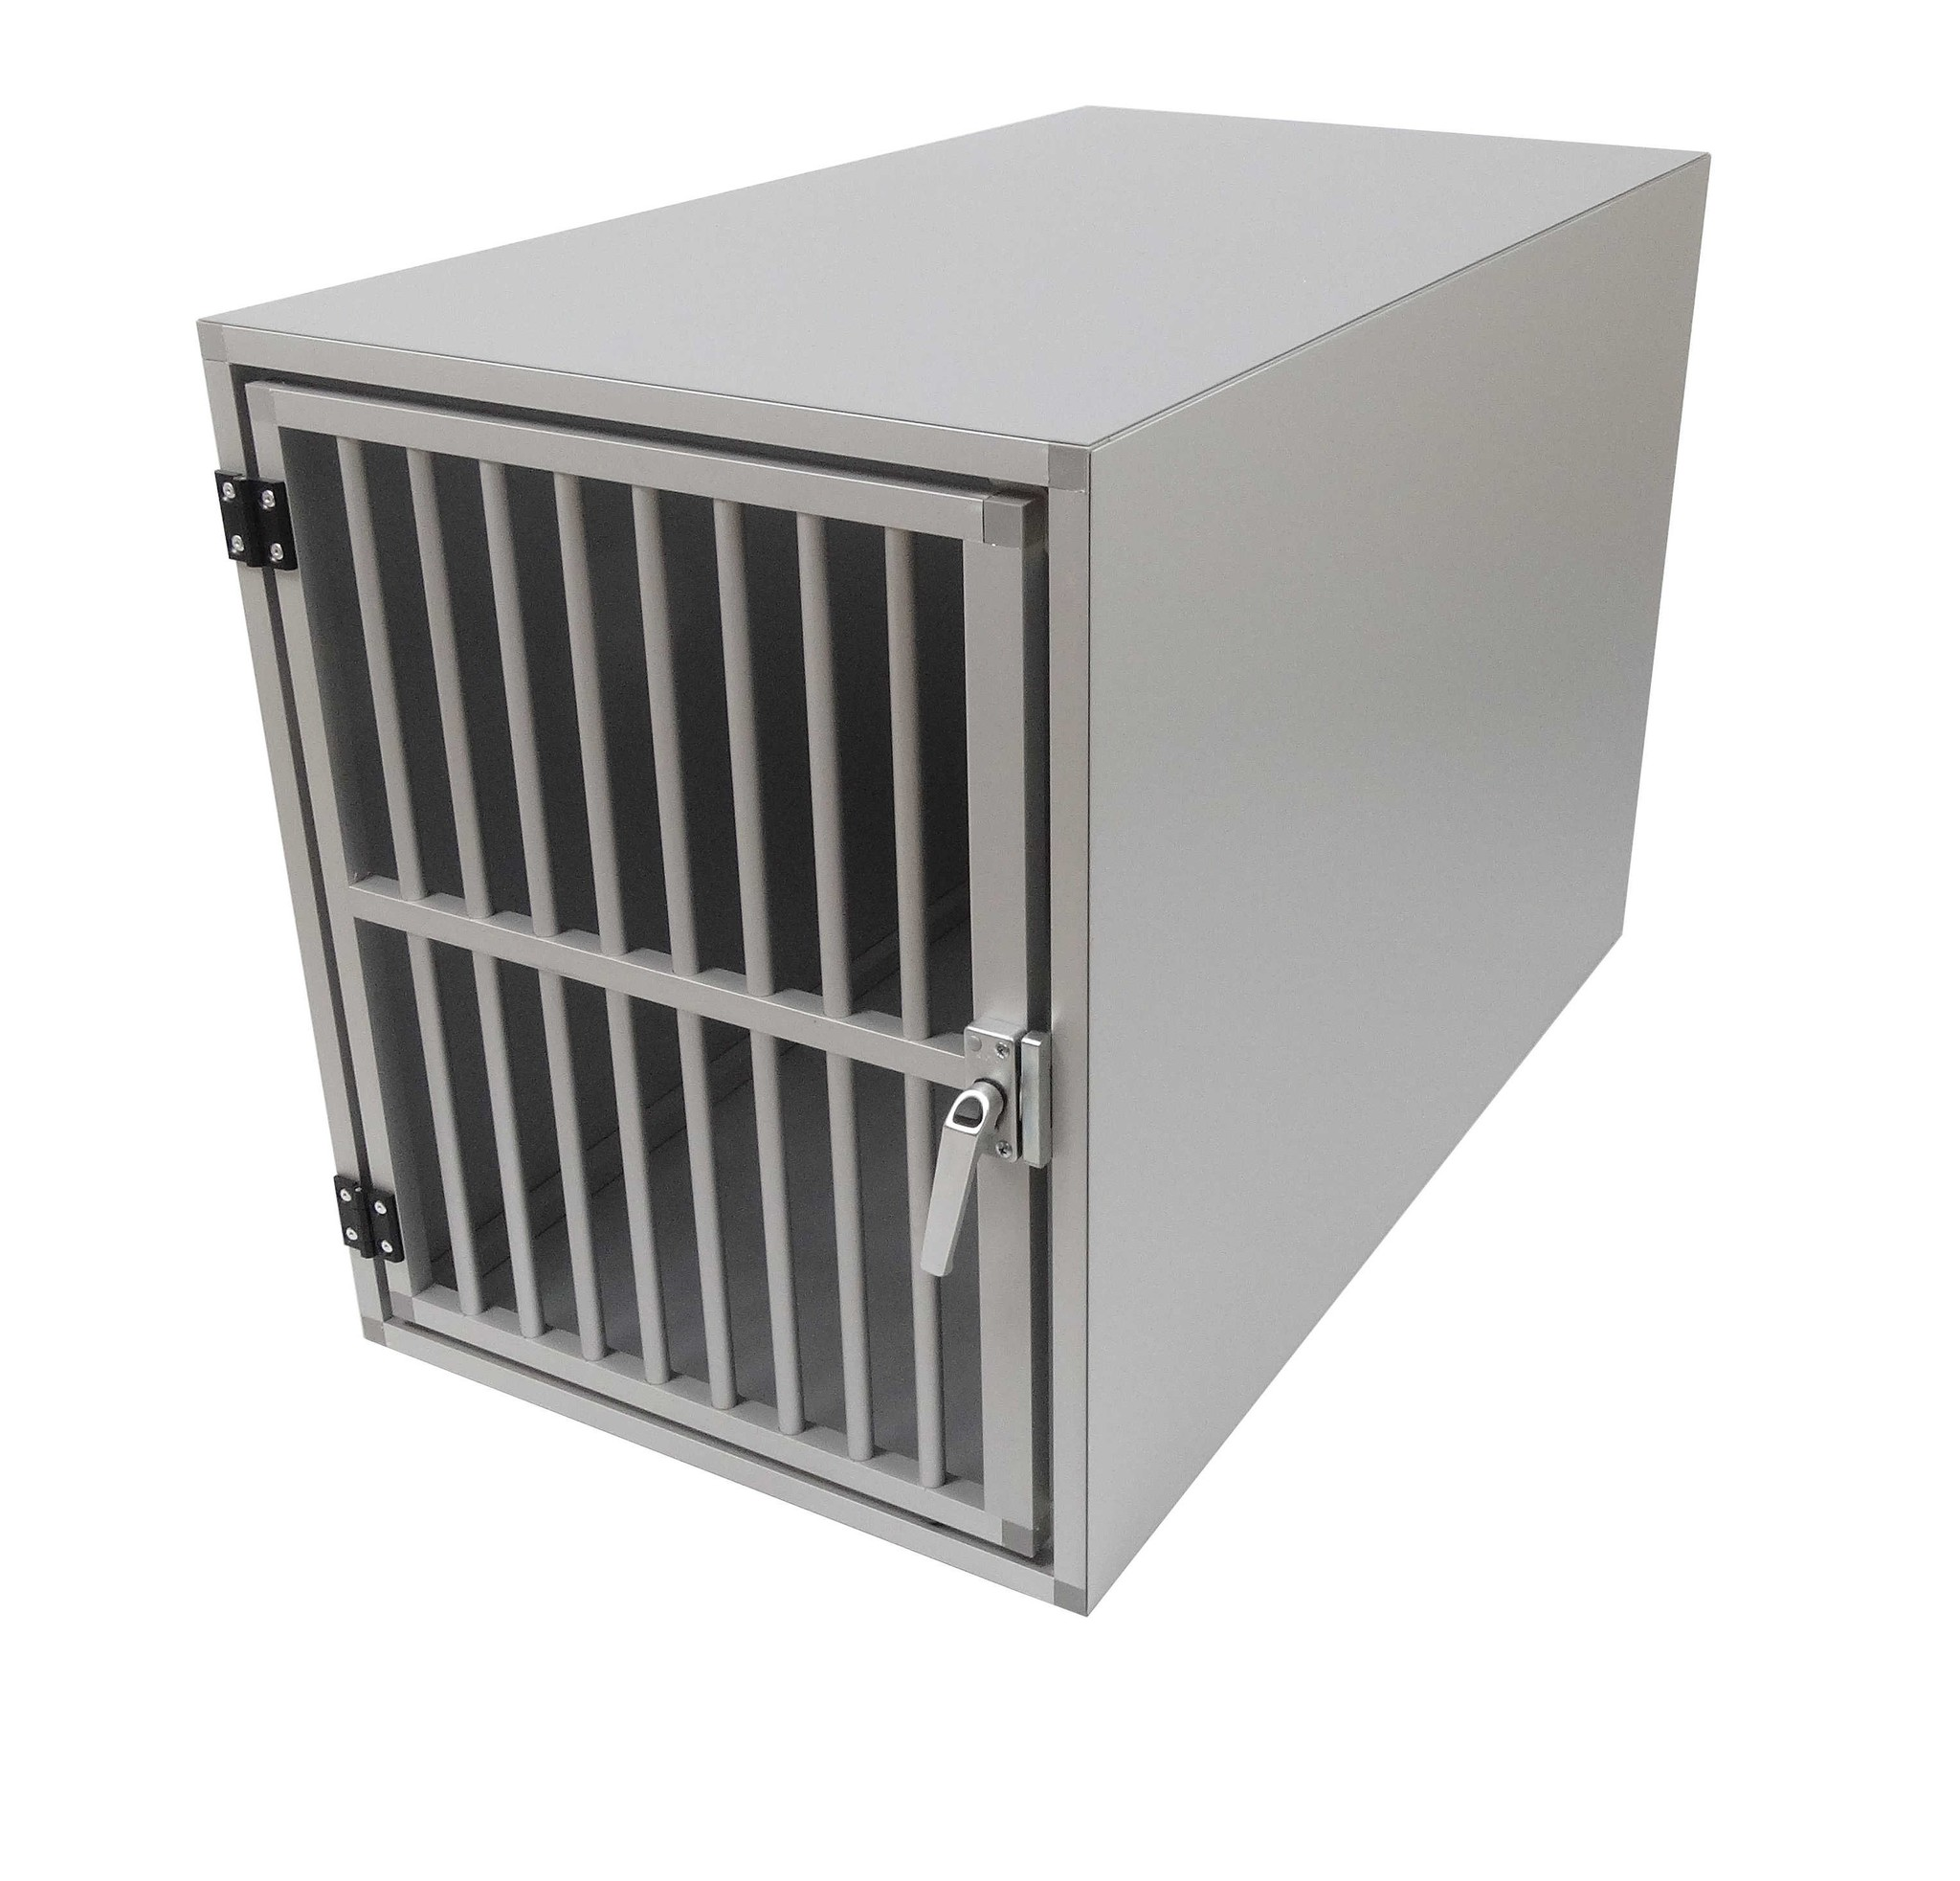 Hundos  Hundos Pro Aluminium Autobench Recht model, 100x55x67 cm met spijlen